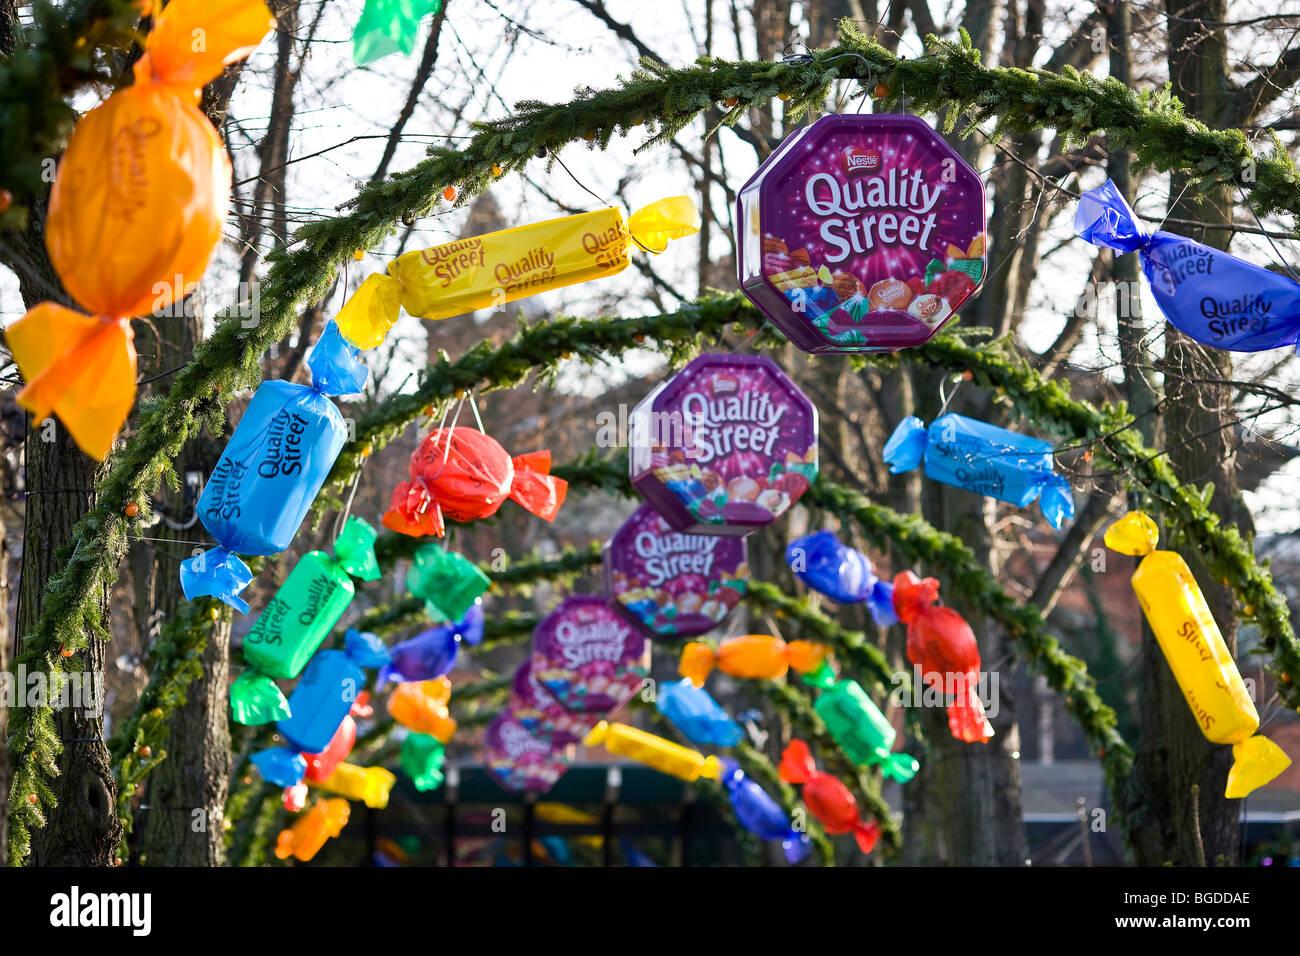 The Quality Street decorations in Tivoli, Copenhagen, Denmark, Europe - Stock Image